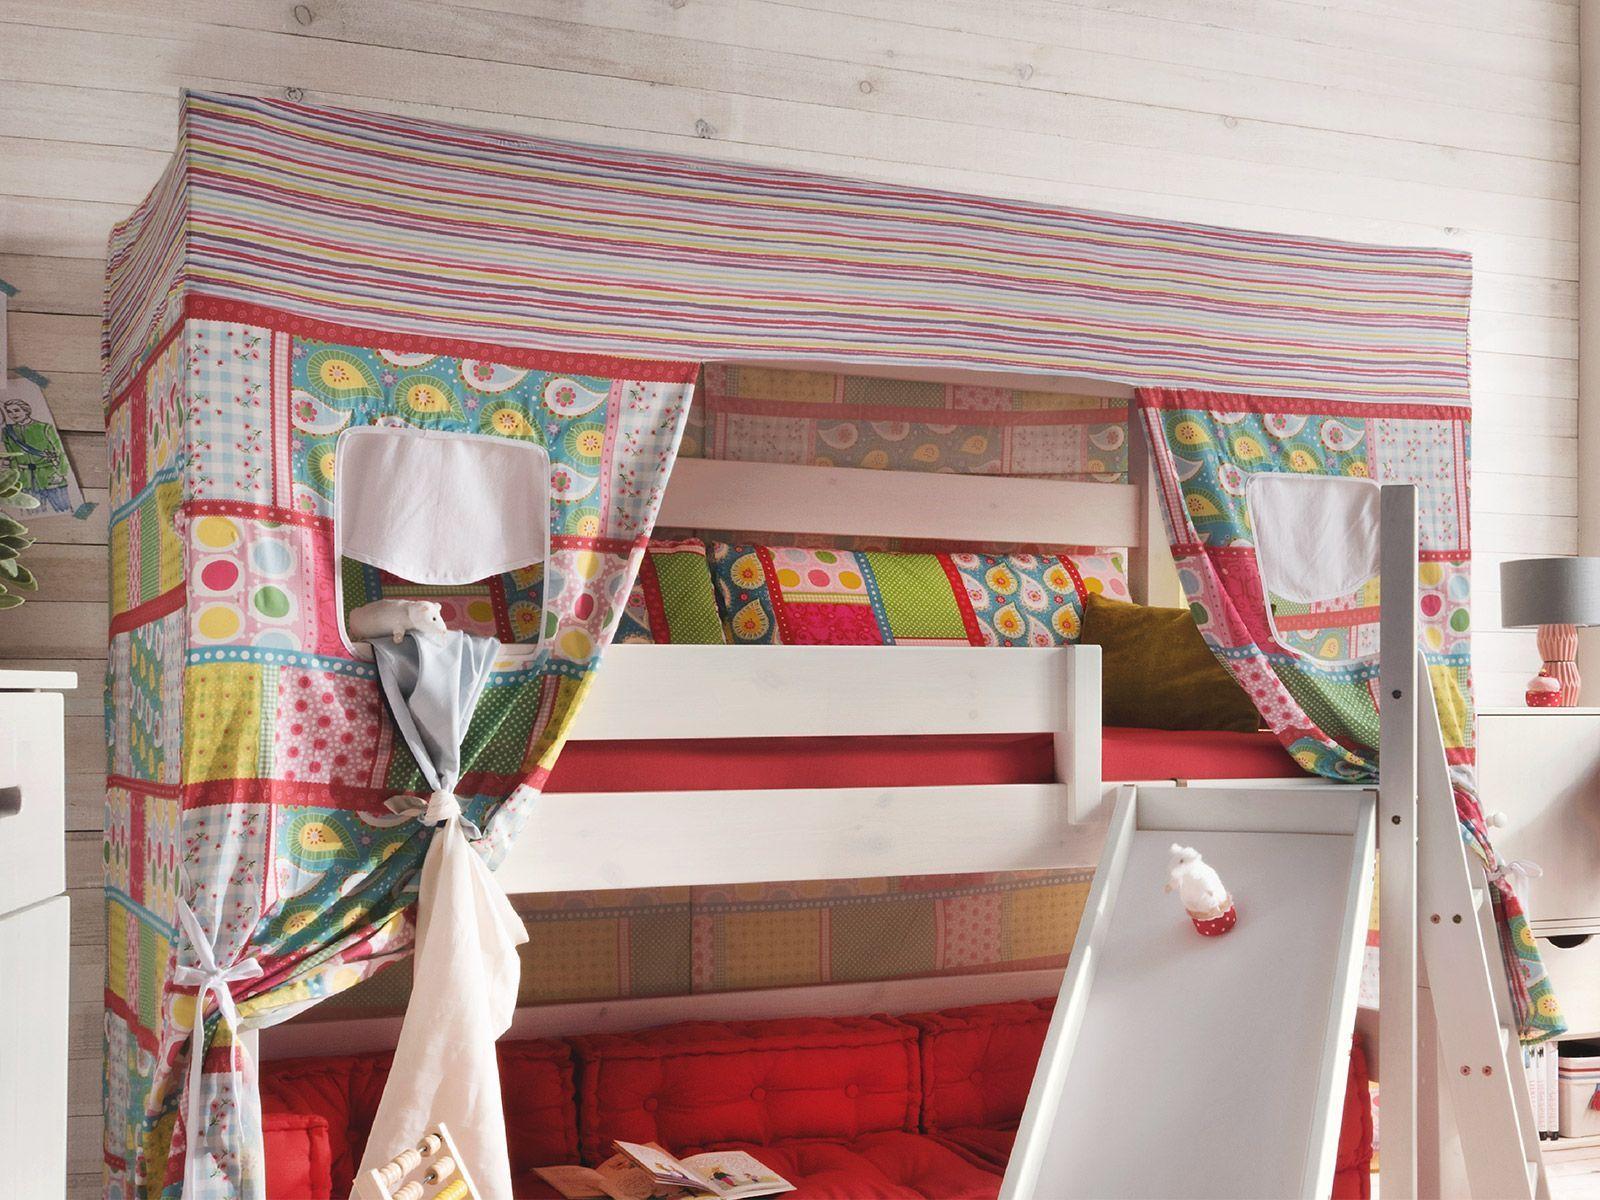 Himmel Für Etagenbett : Himmelbett hochbett kiefer mit rutsche & baldachin kids dreams